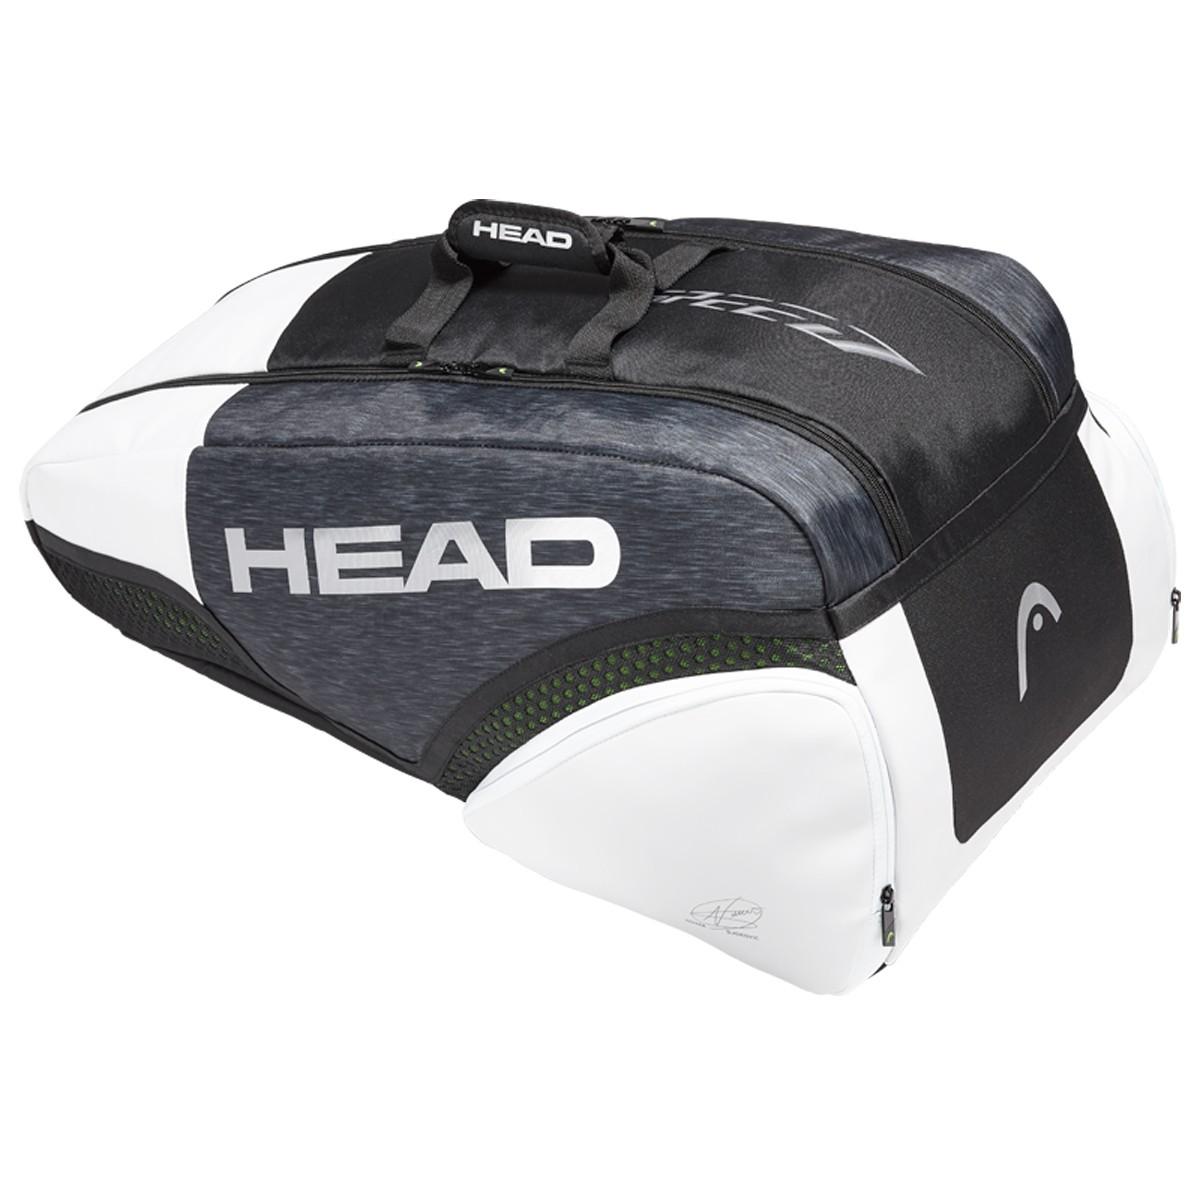 SAC DE TENNIS HEAD DJOKOVIC 9R SUPERCOMBI